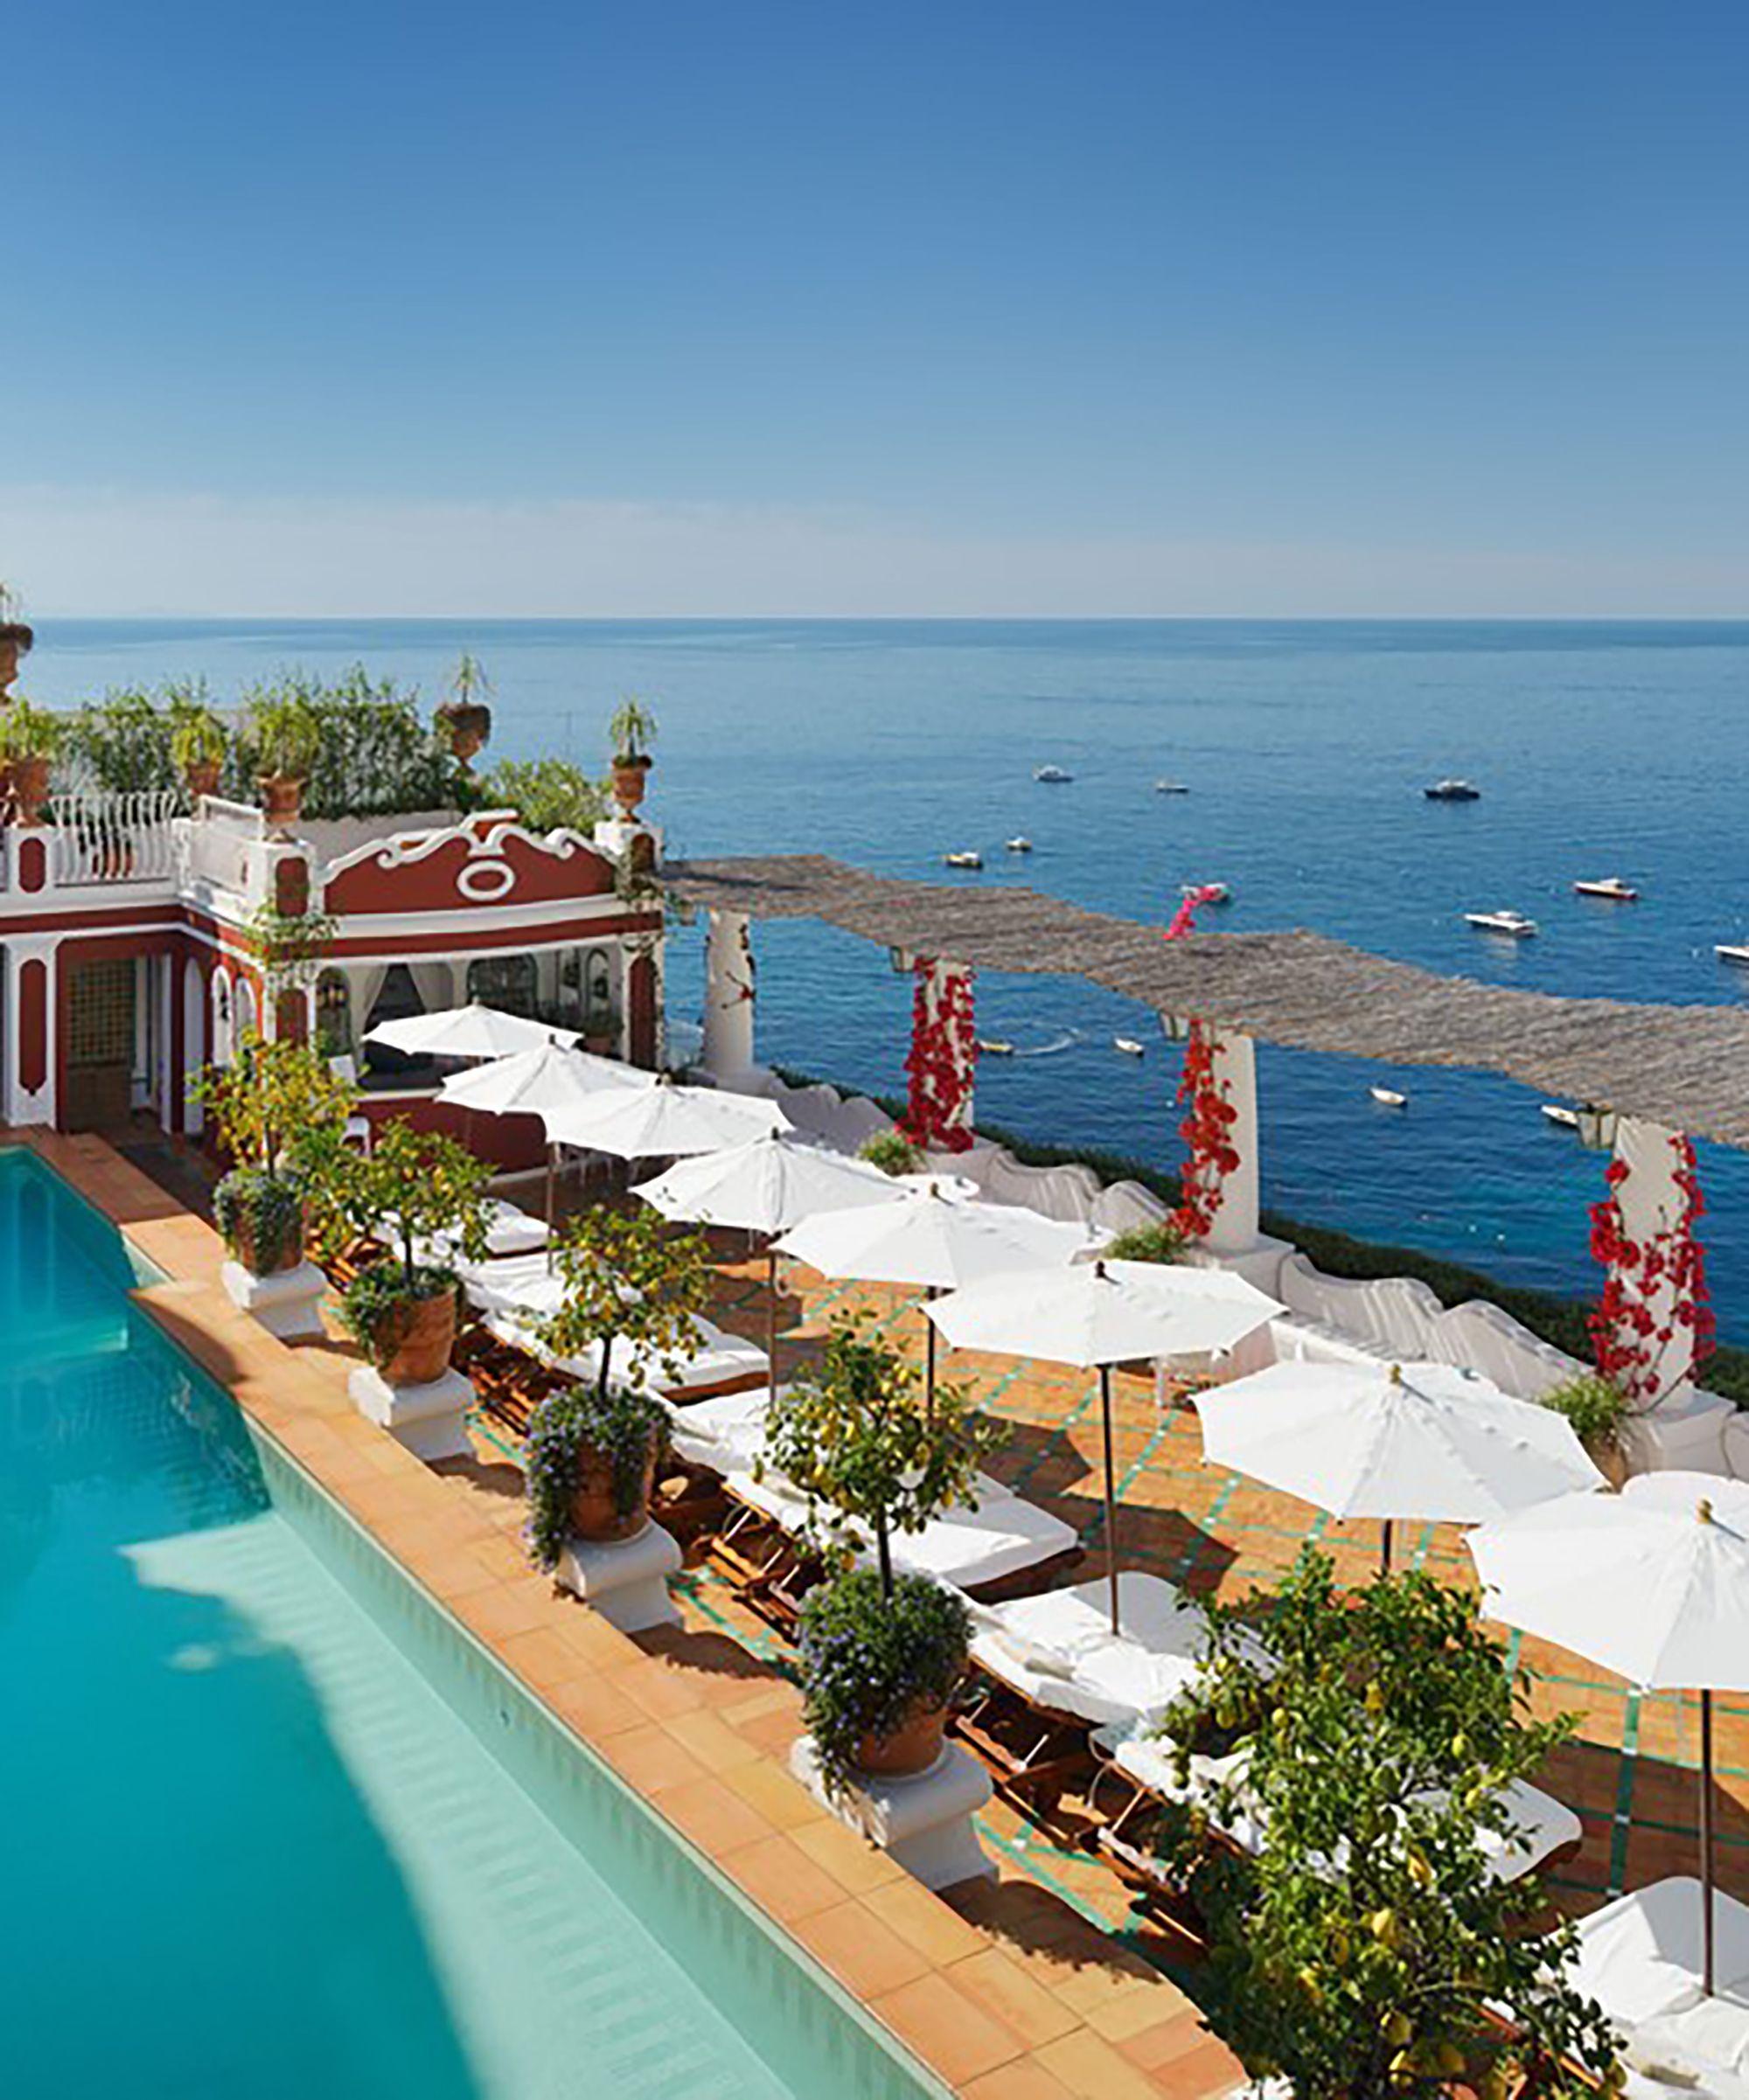 10 Insane 5 Star Hotels Worth Saving For Positano Hotels Italy